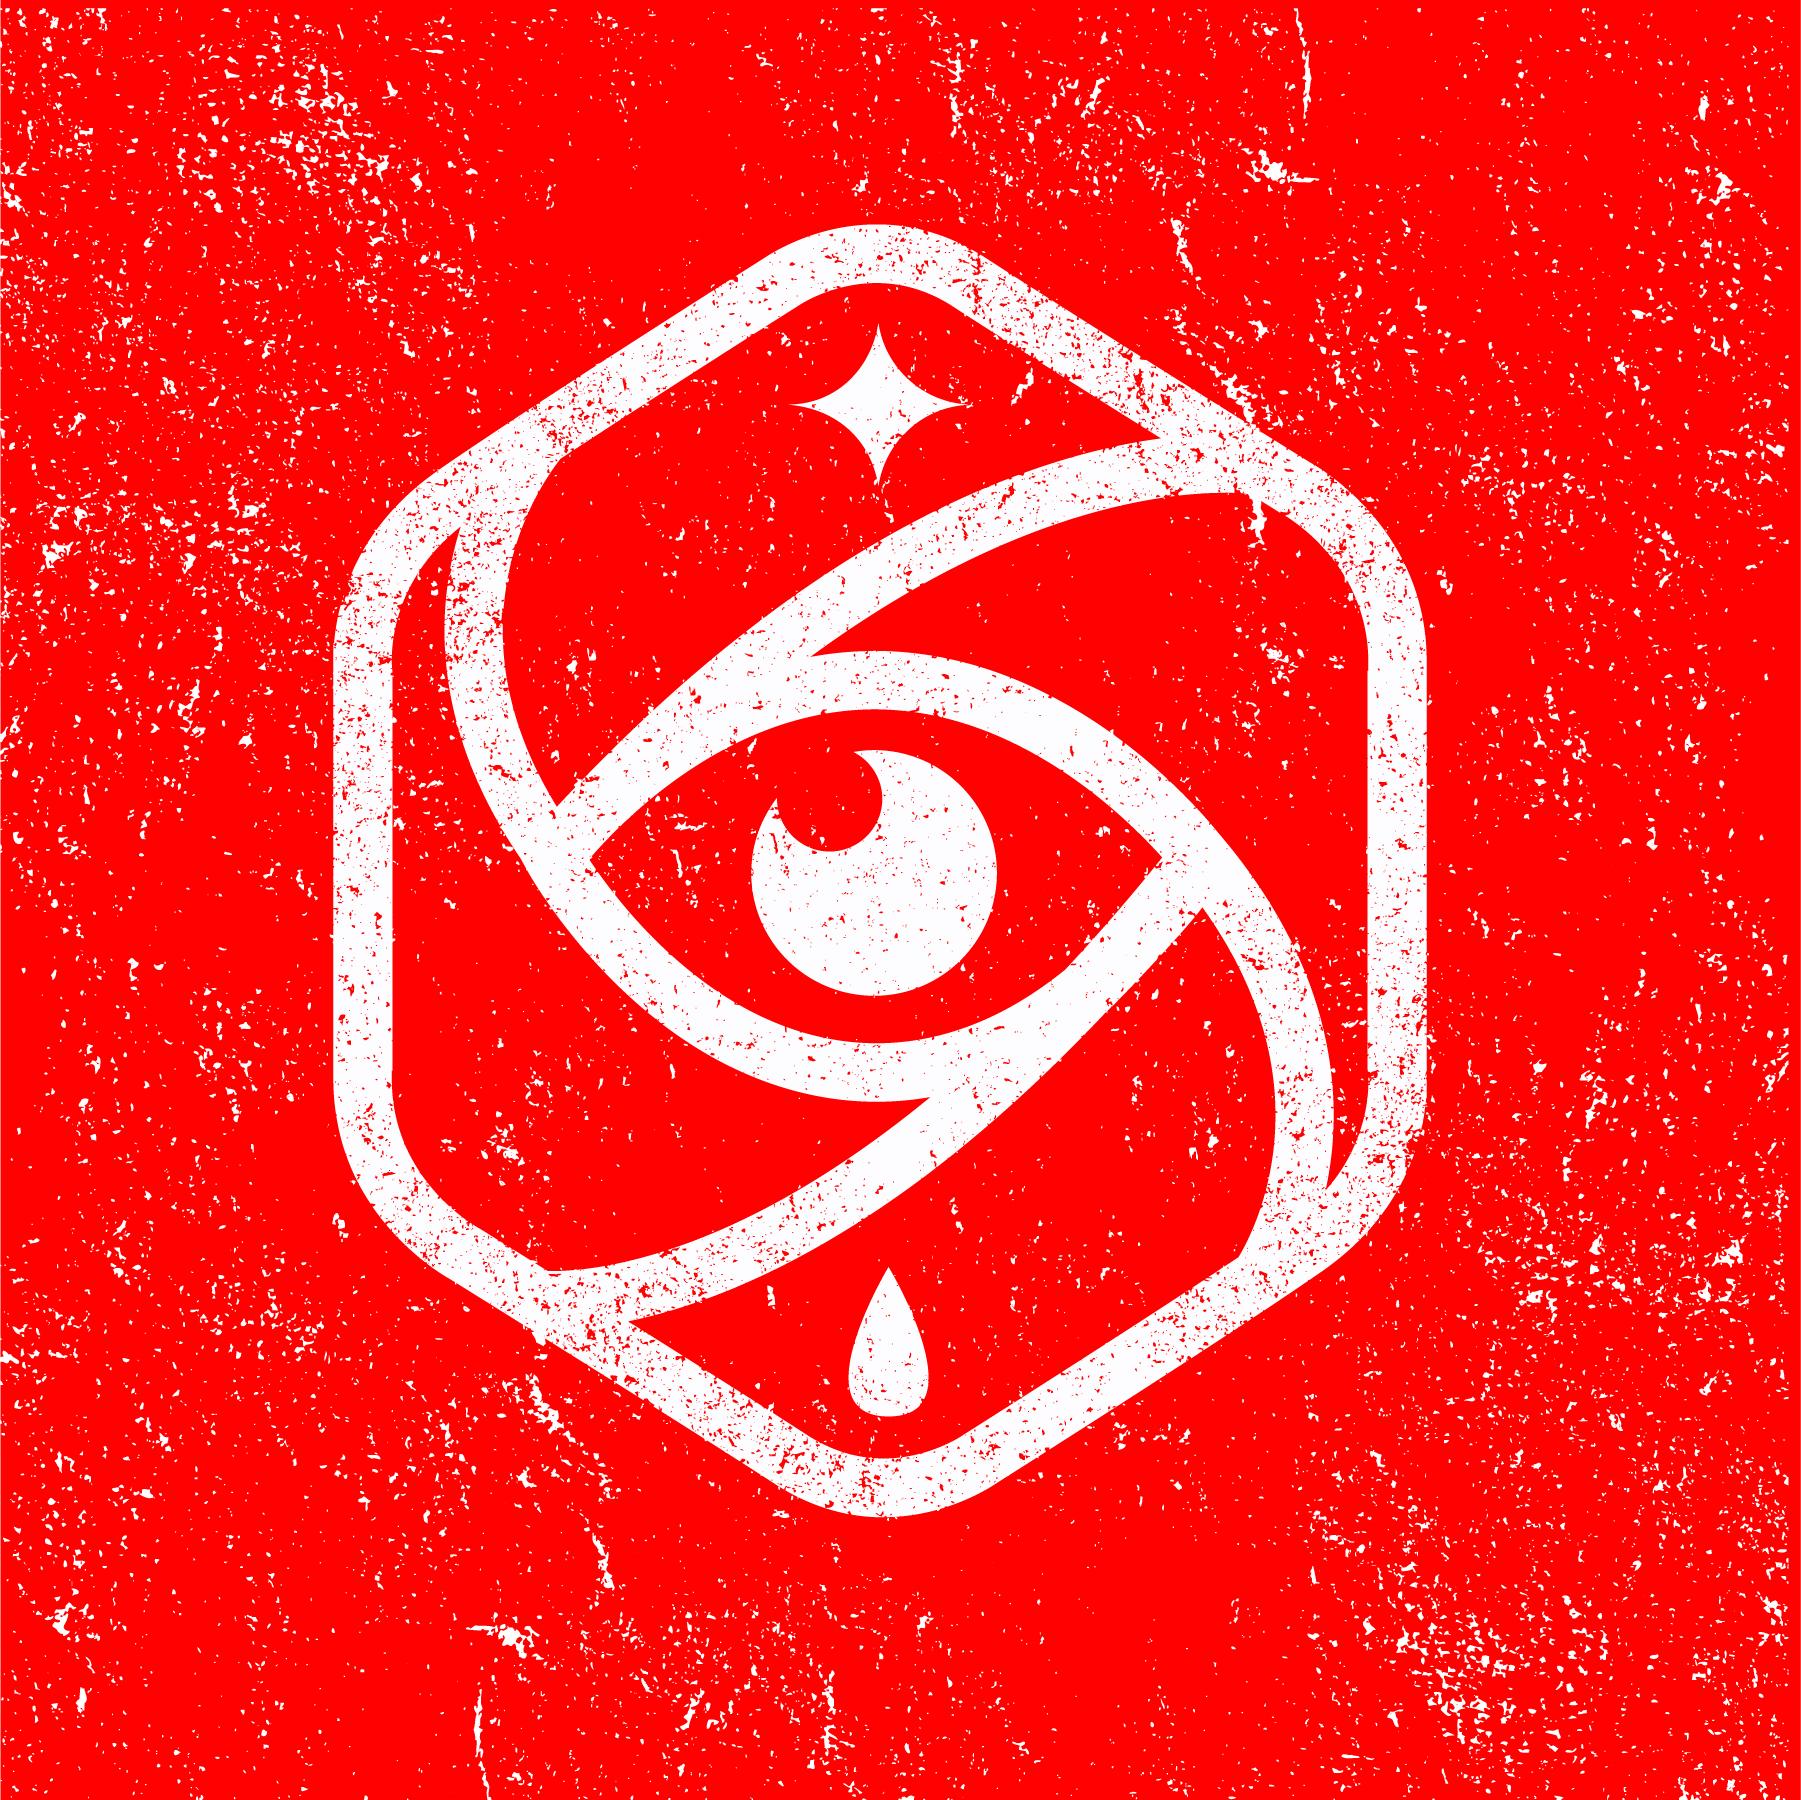 RED EYE 2 - WHITE.jpg